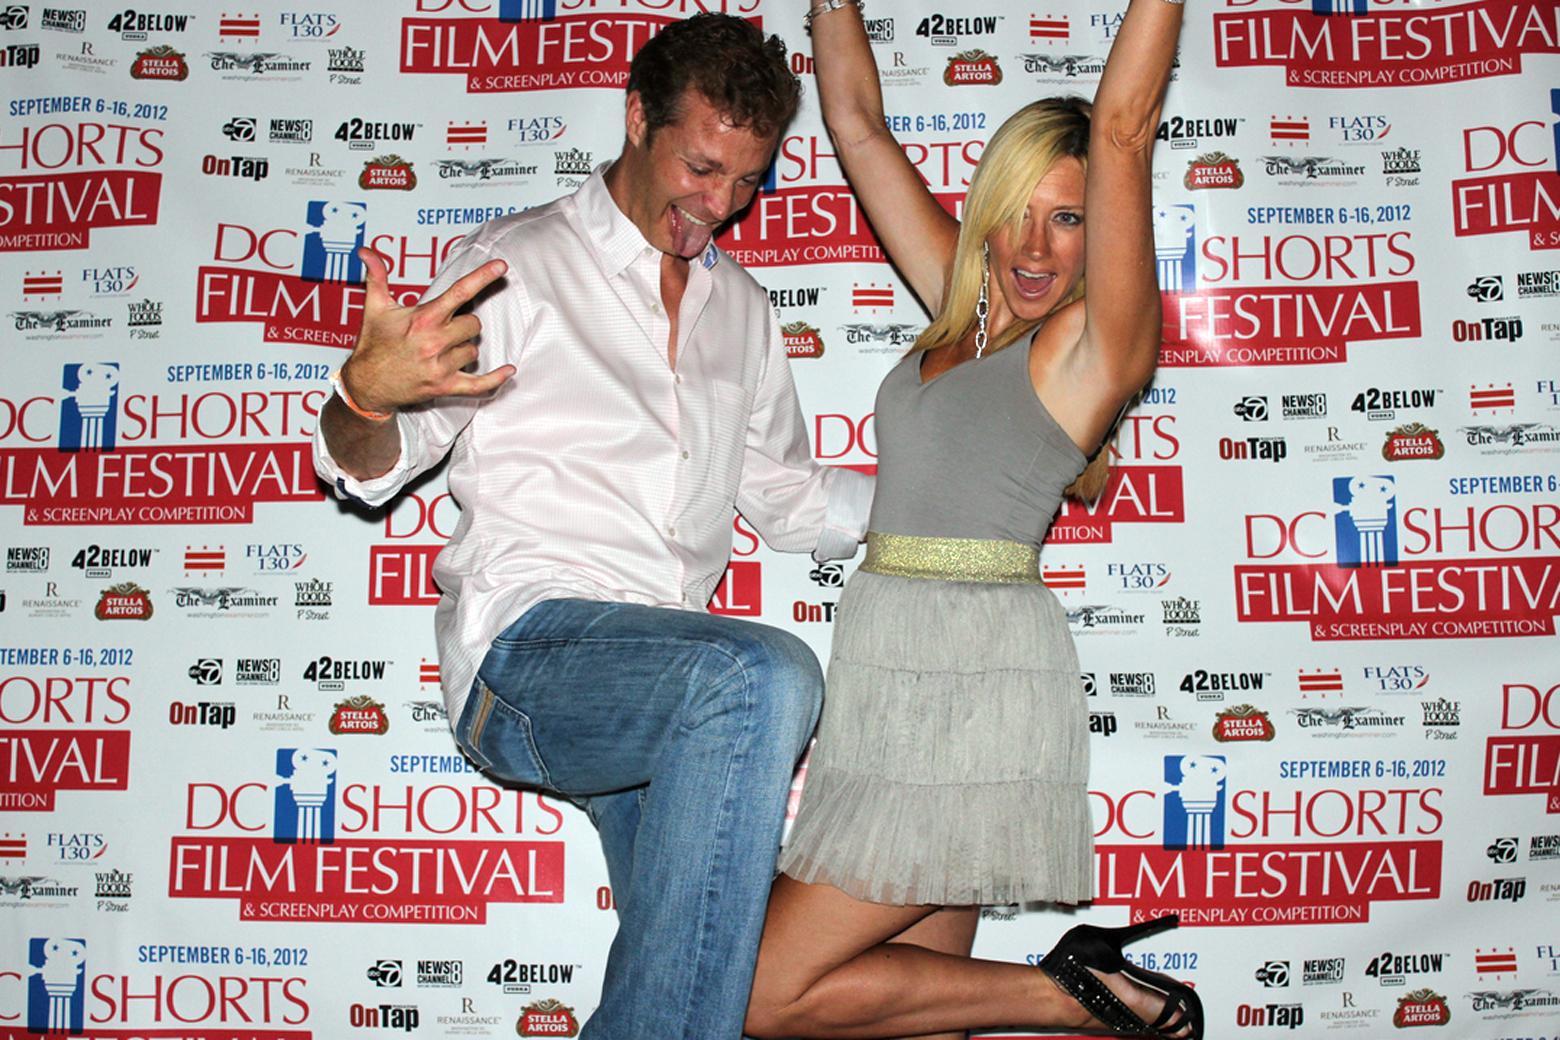 DC Shorts: 12th annual film festival gets underway